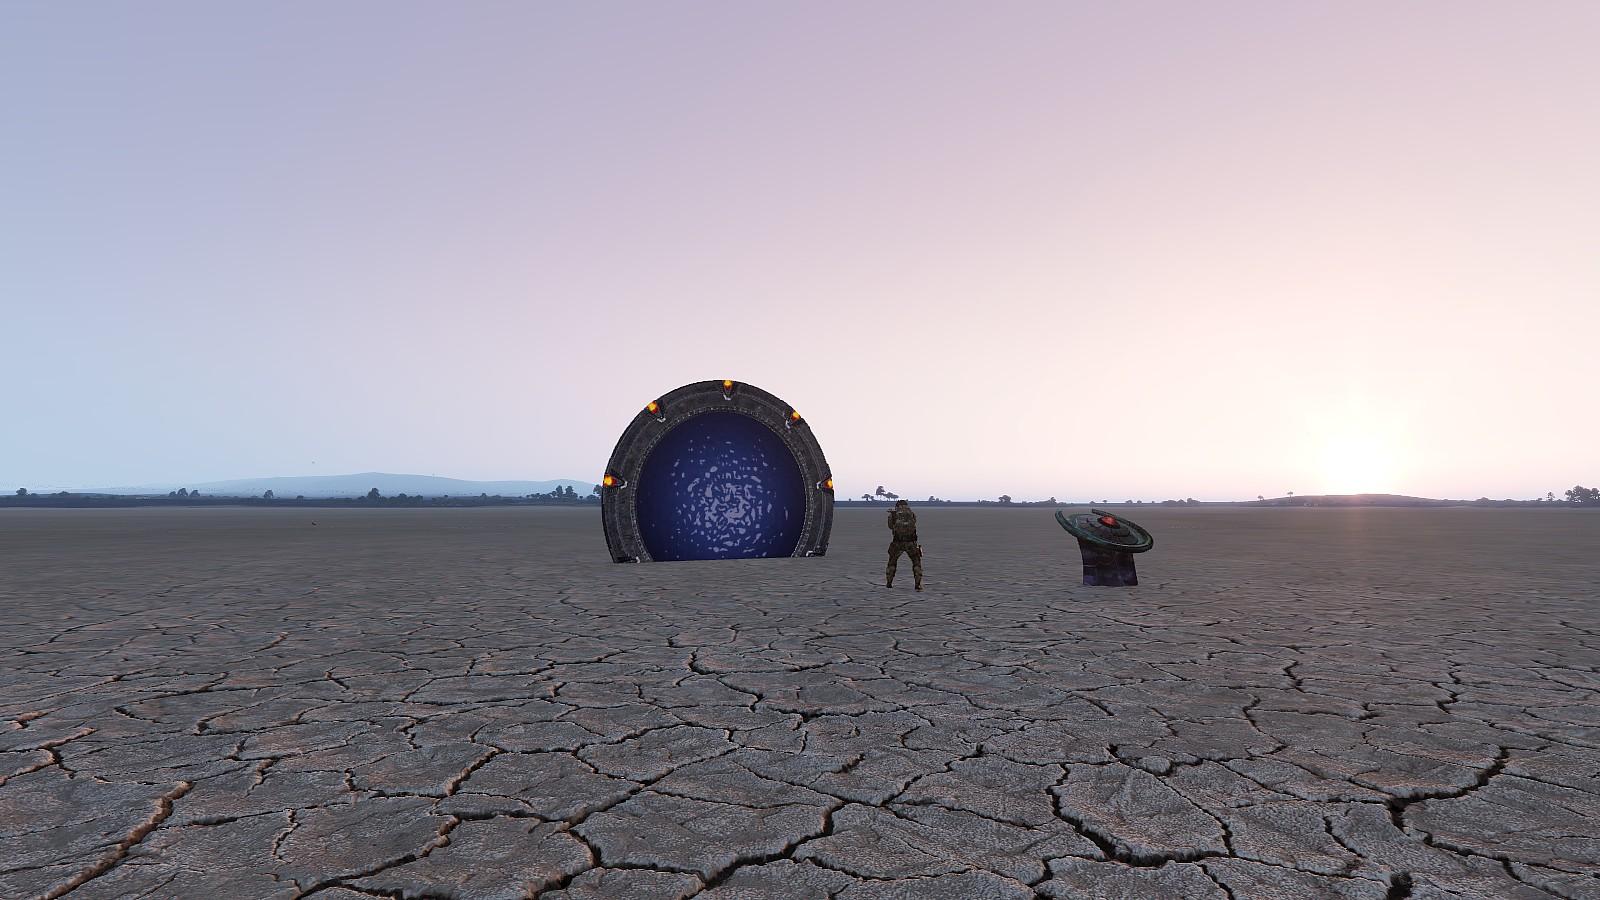 Stargate ARMA – Stargate Mods for ARMA 3